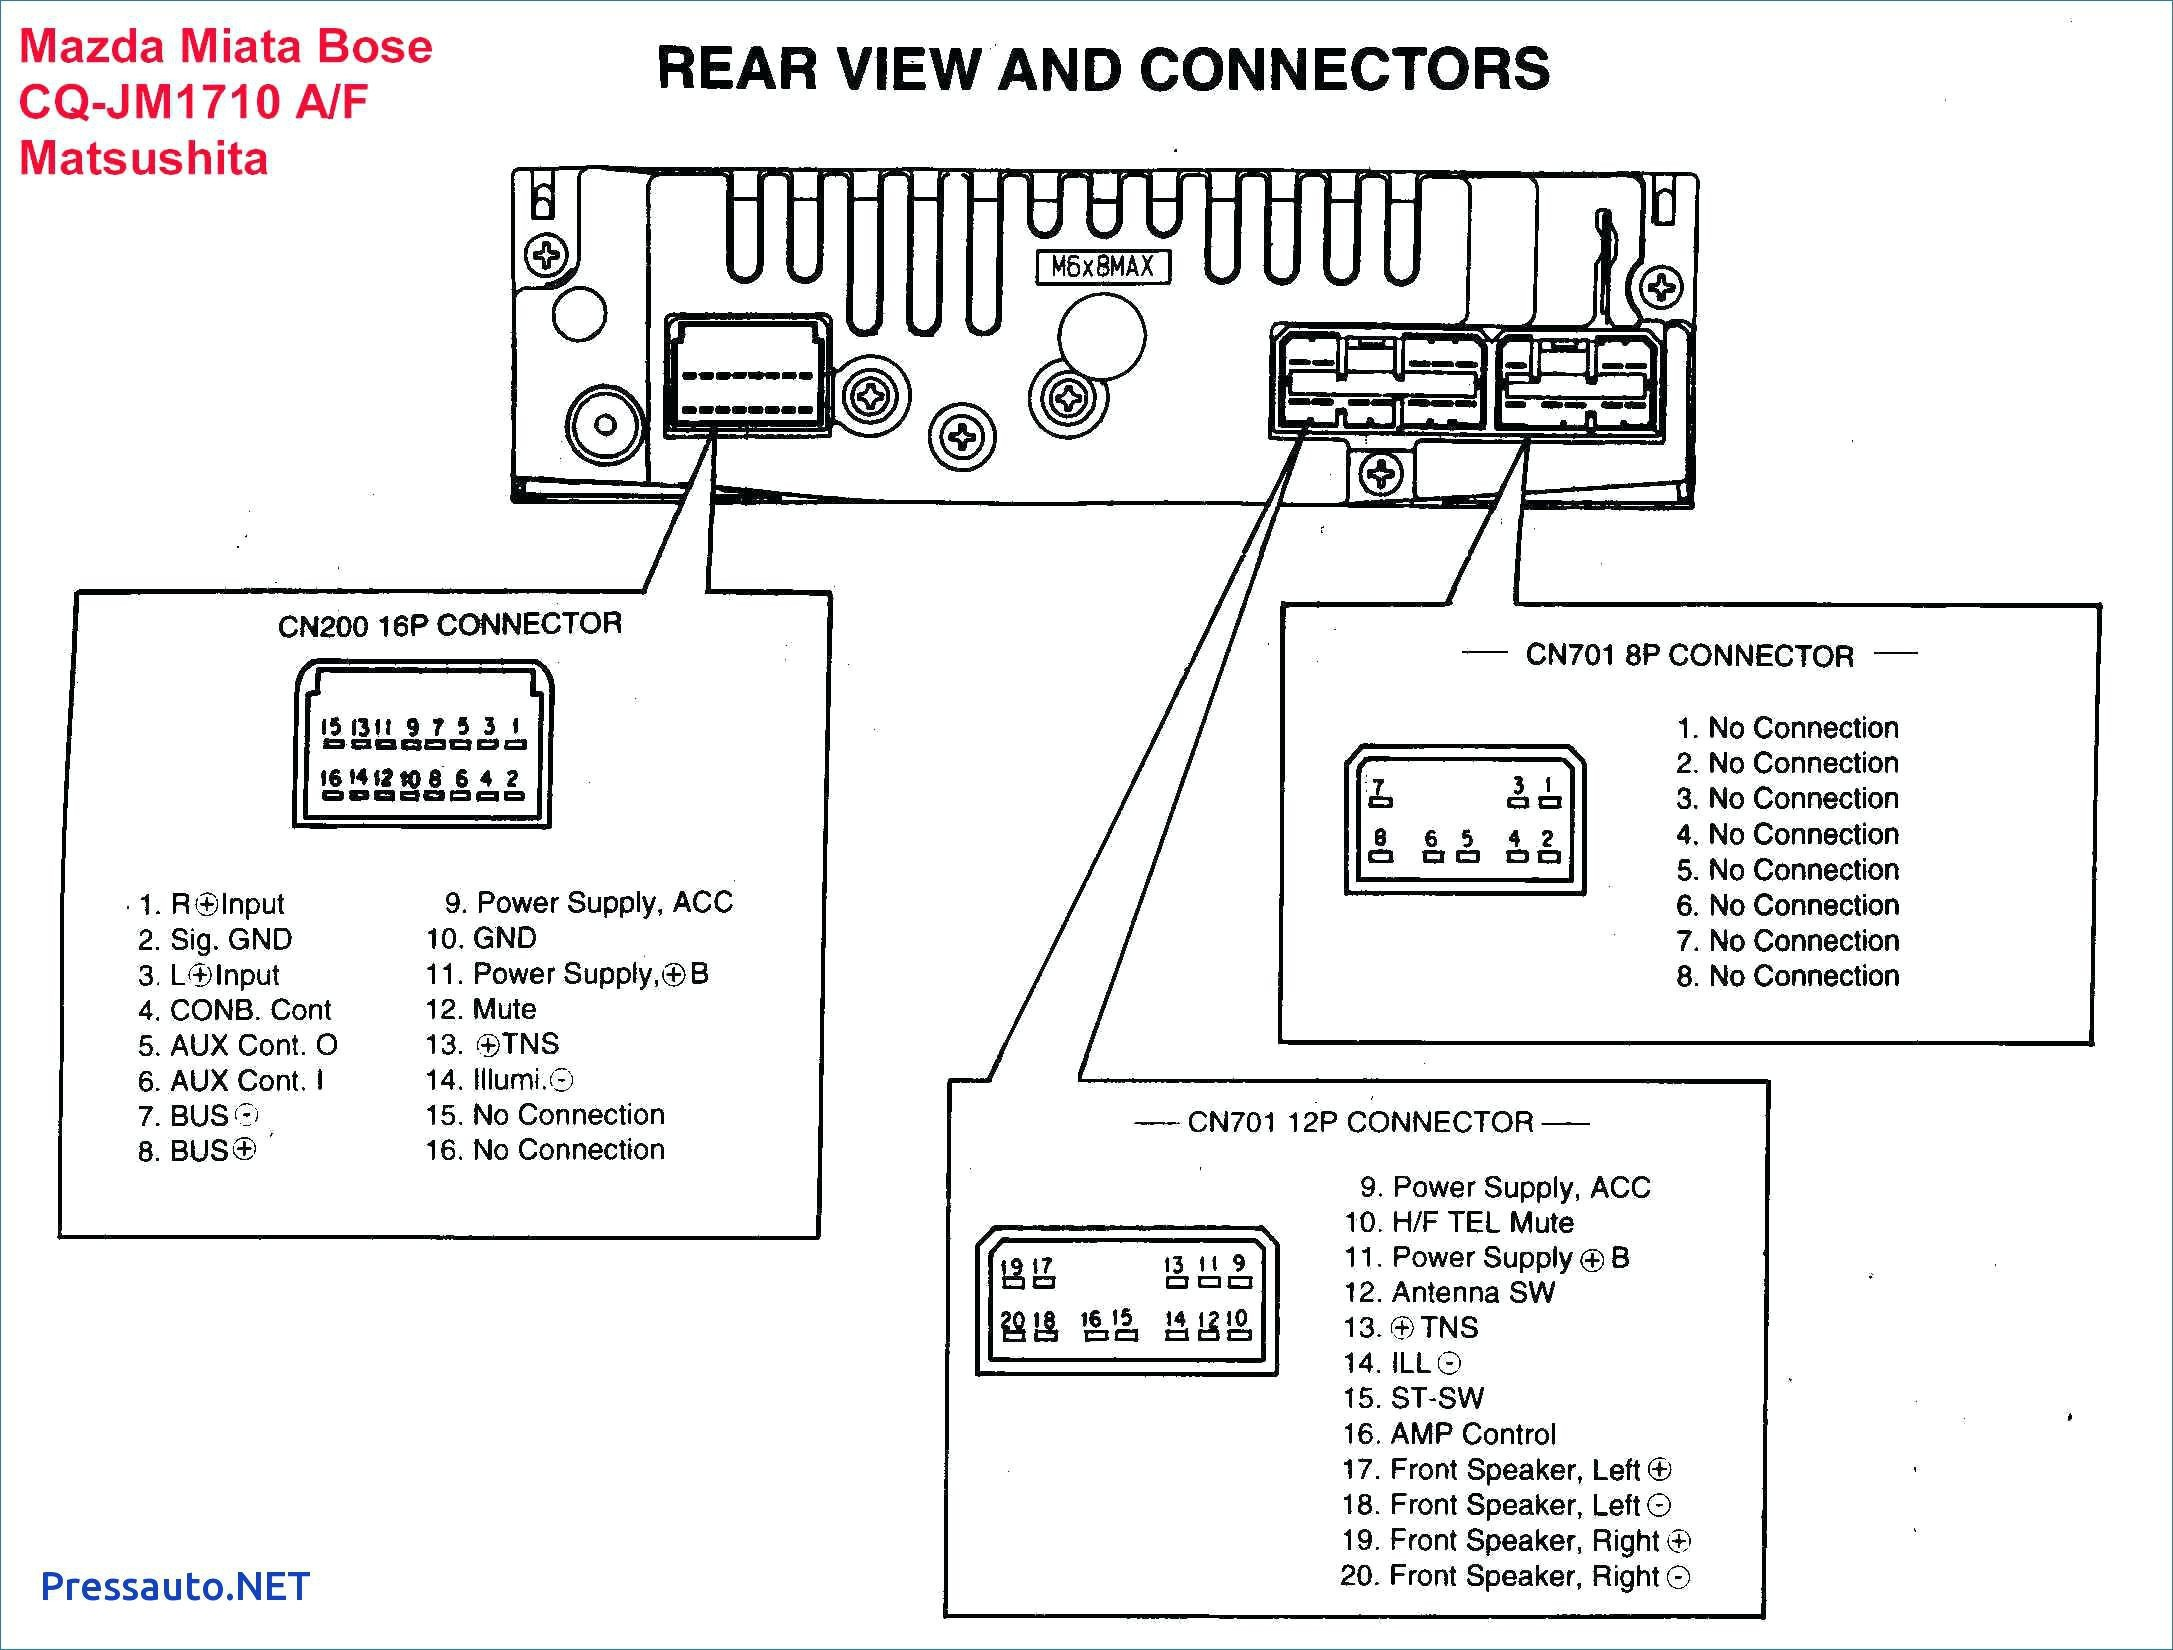 Bose Car Amplifier Wiring Diagram 1999 Maxima Stereo Wiring Diagram Of Bose Car Amplifier Wiring Diagram